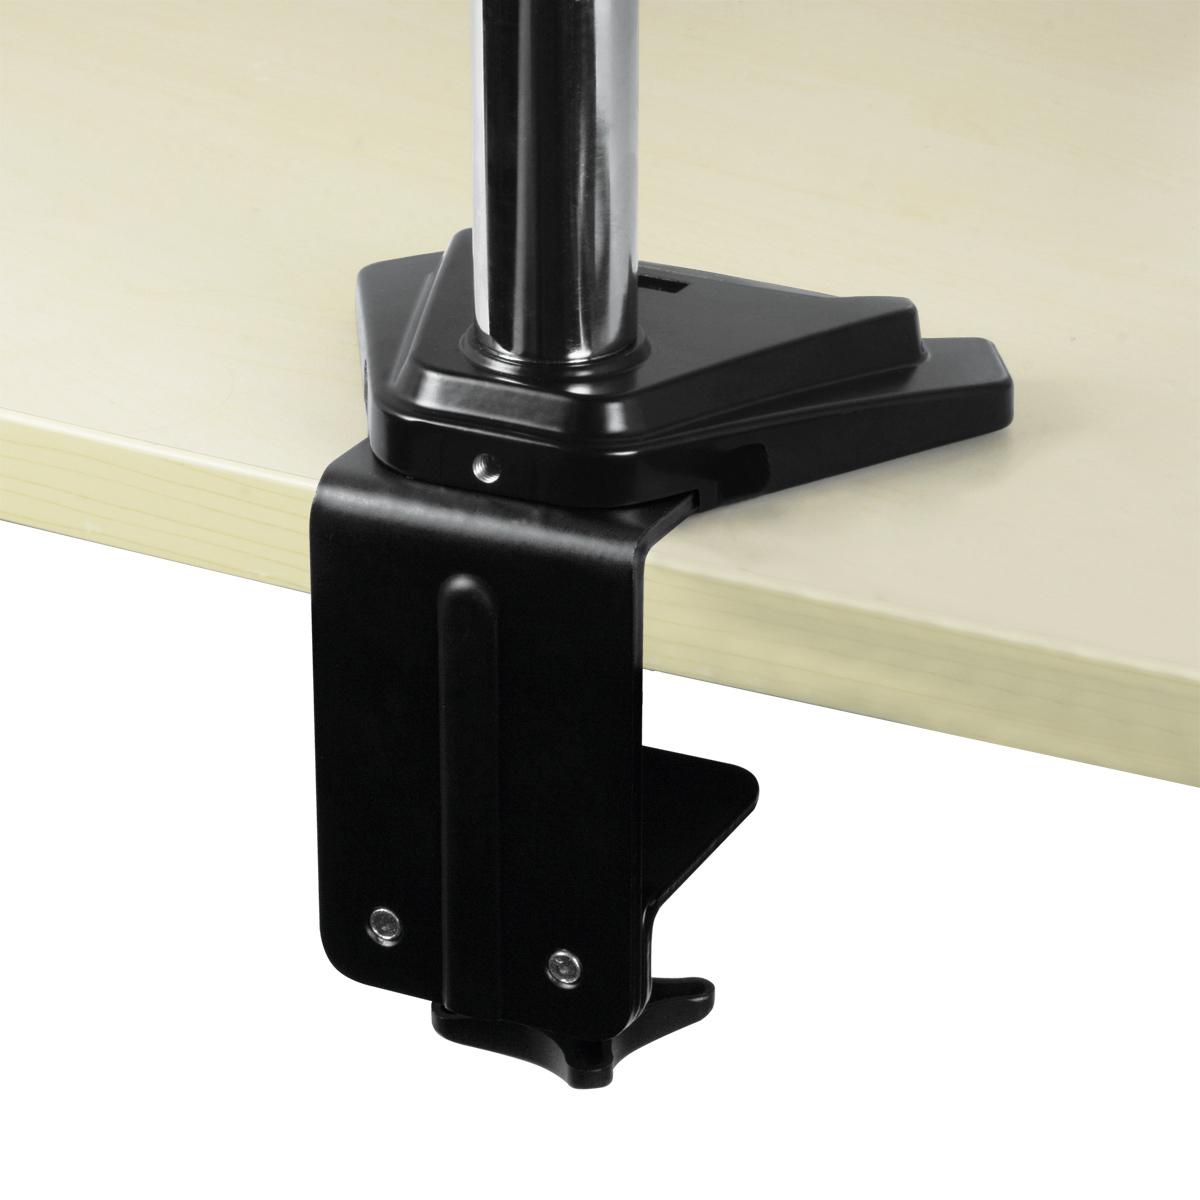 Suport TV / Monitor ARCTIC Z2 Pro (Gen 2) negru, 13 - 27 inch